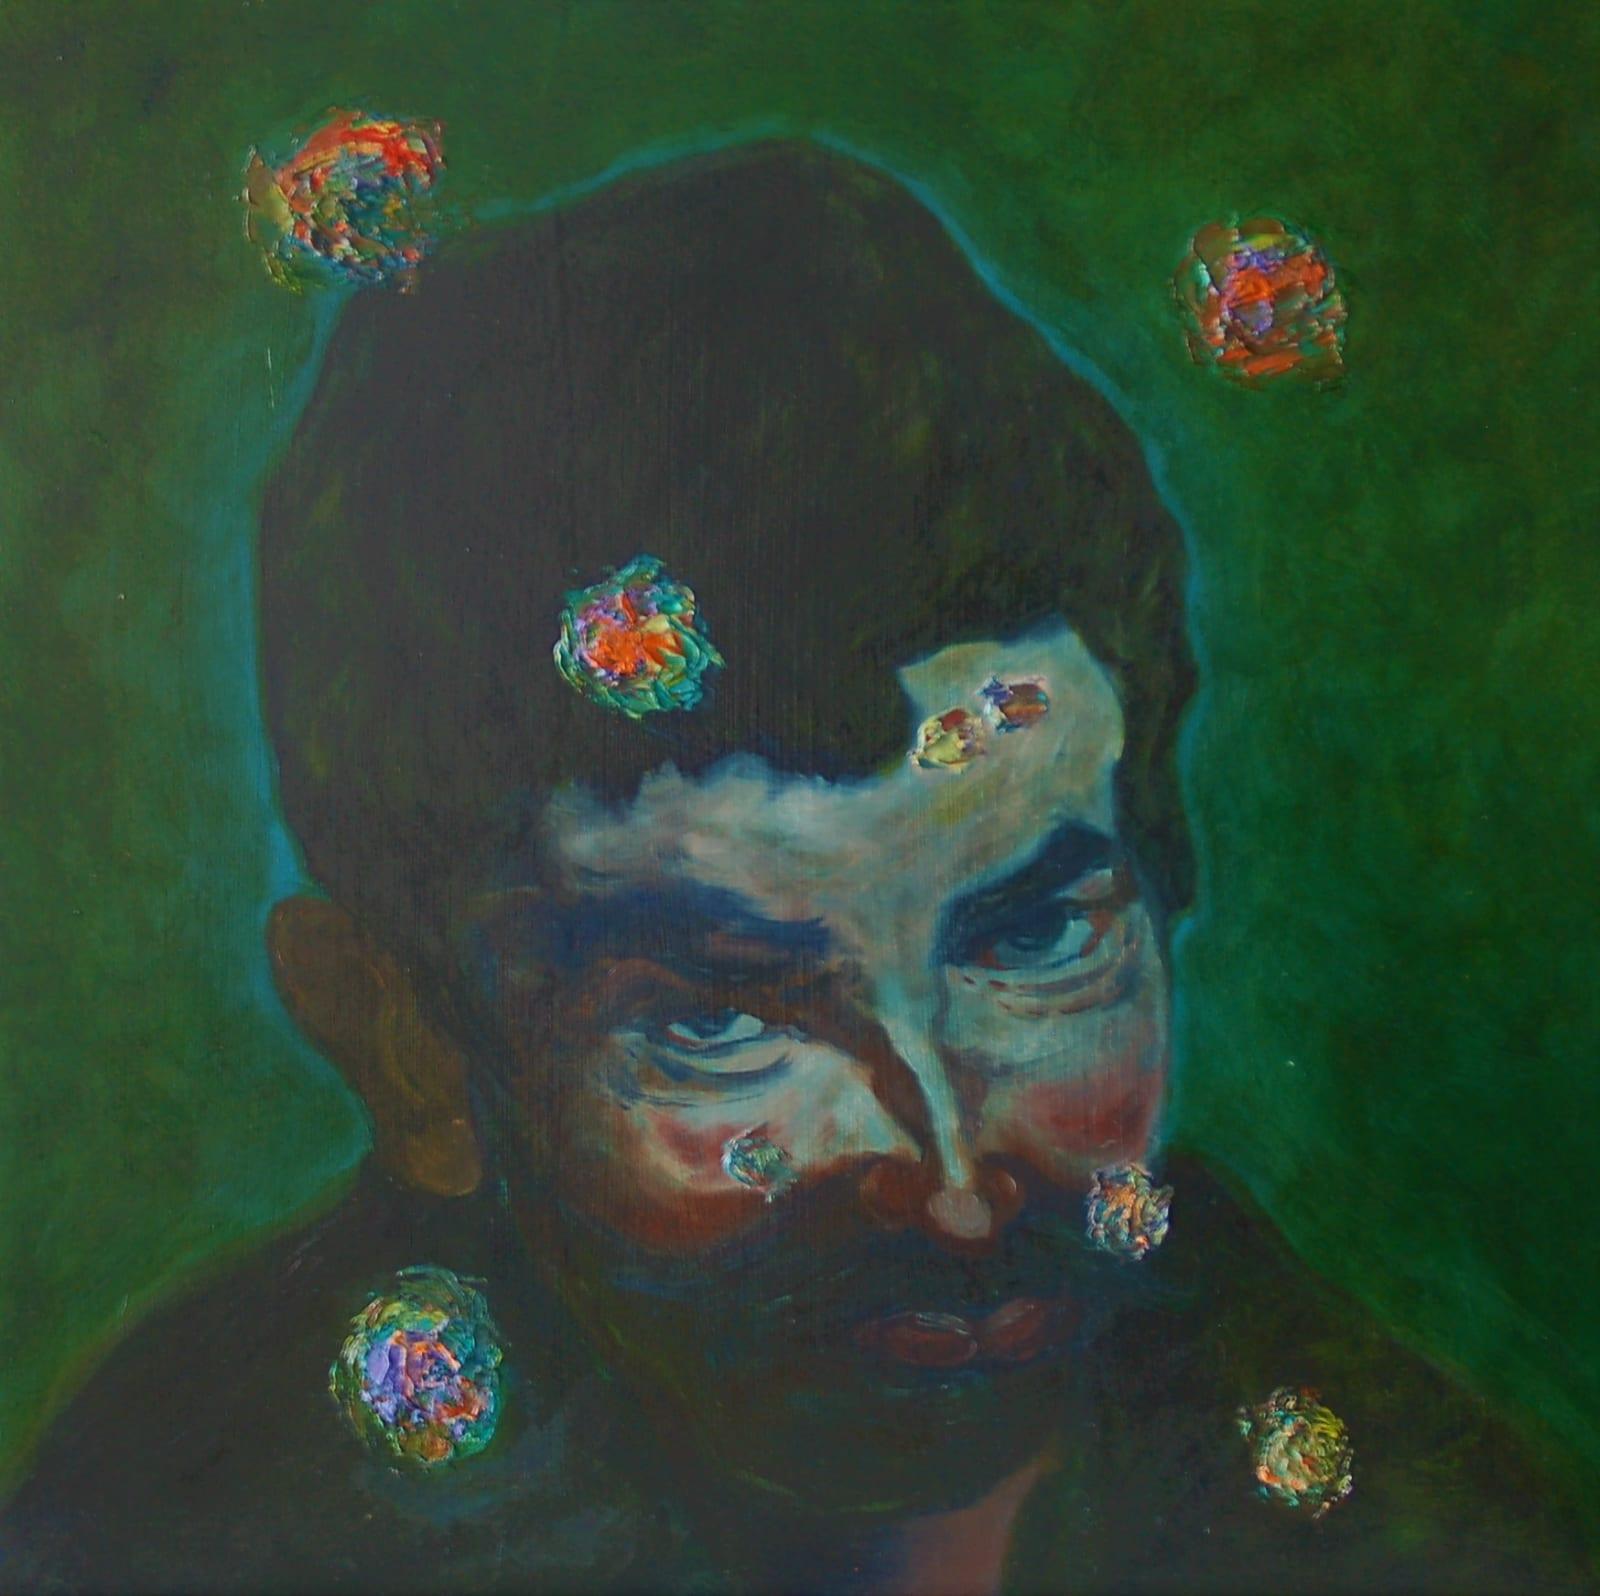 Richard Armendariz Beauty Marks: Sons of Velazquez V, 2020 Signed and dated on back of artwork Oil on birch panel 24 x 24